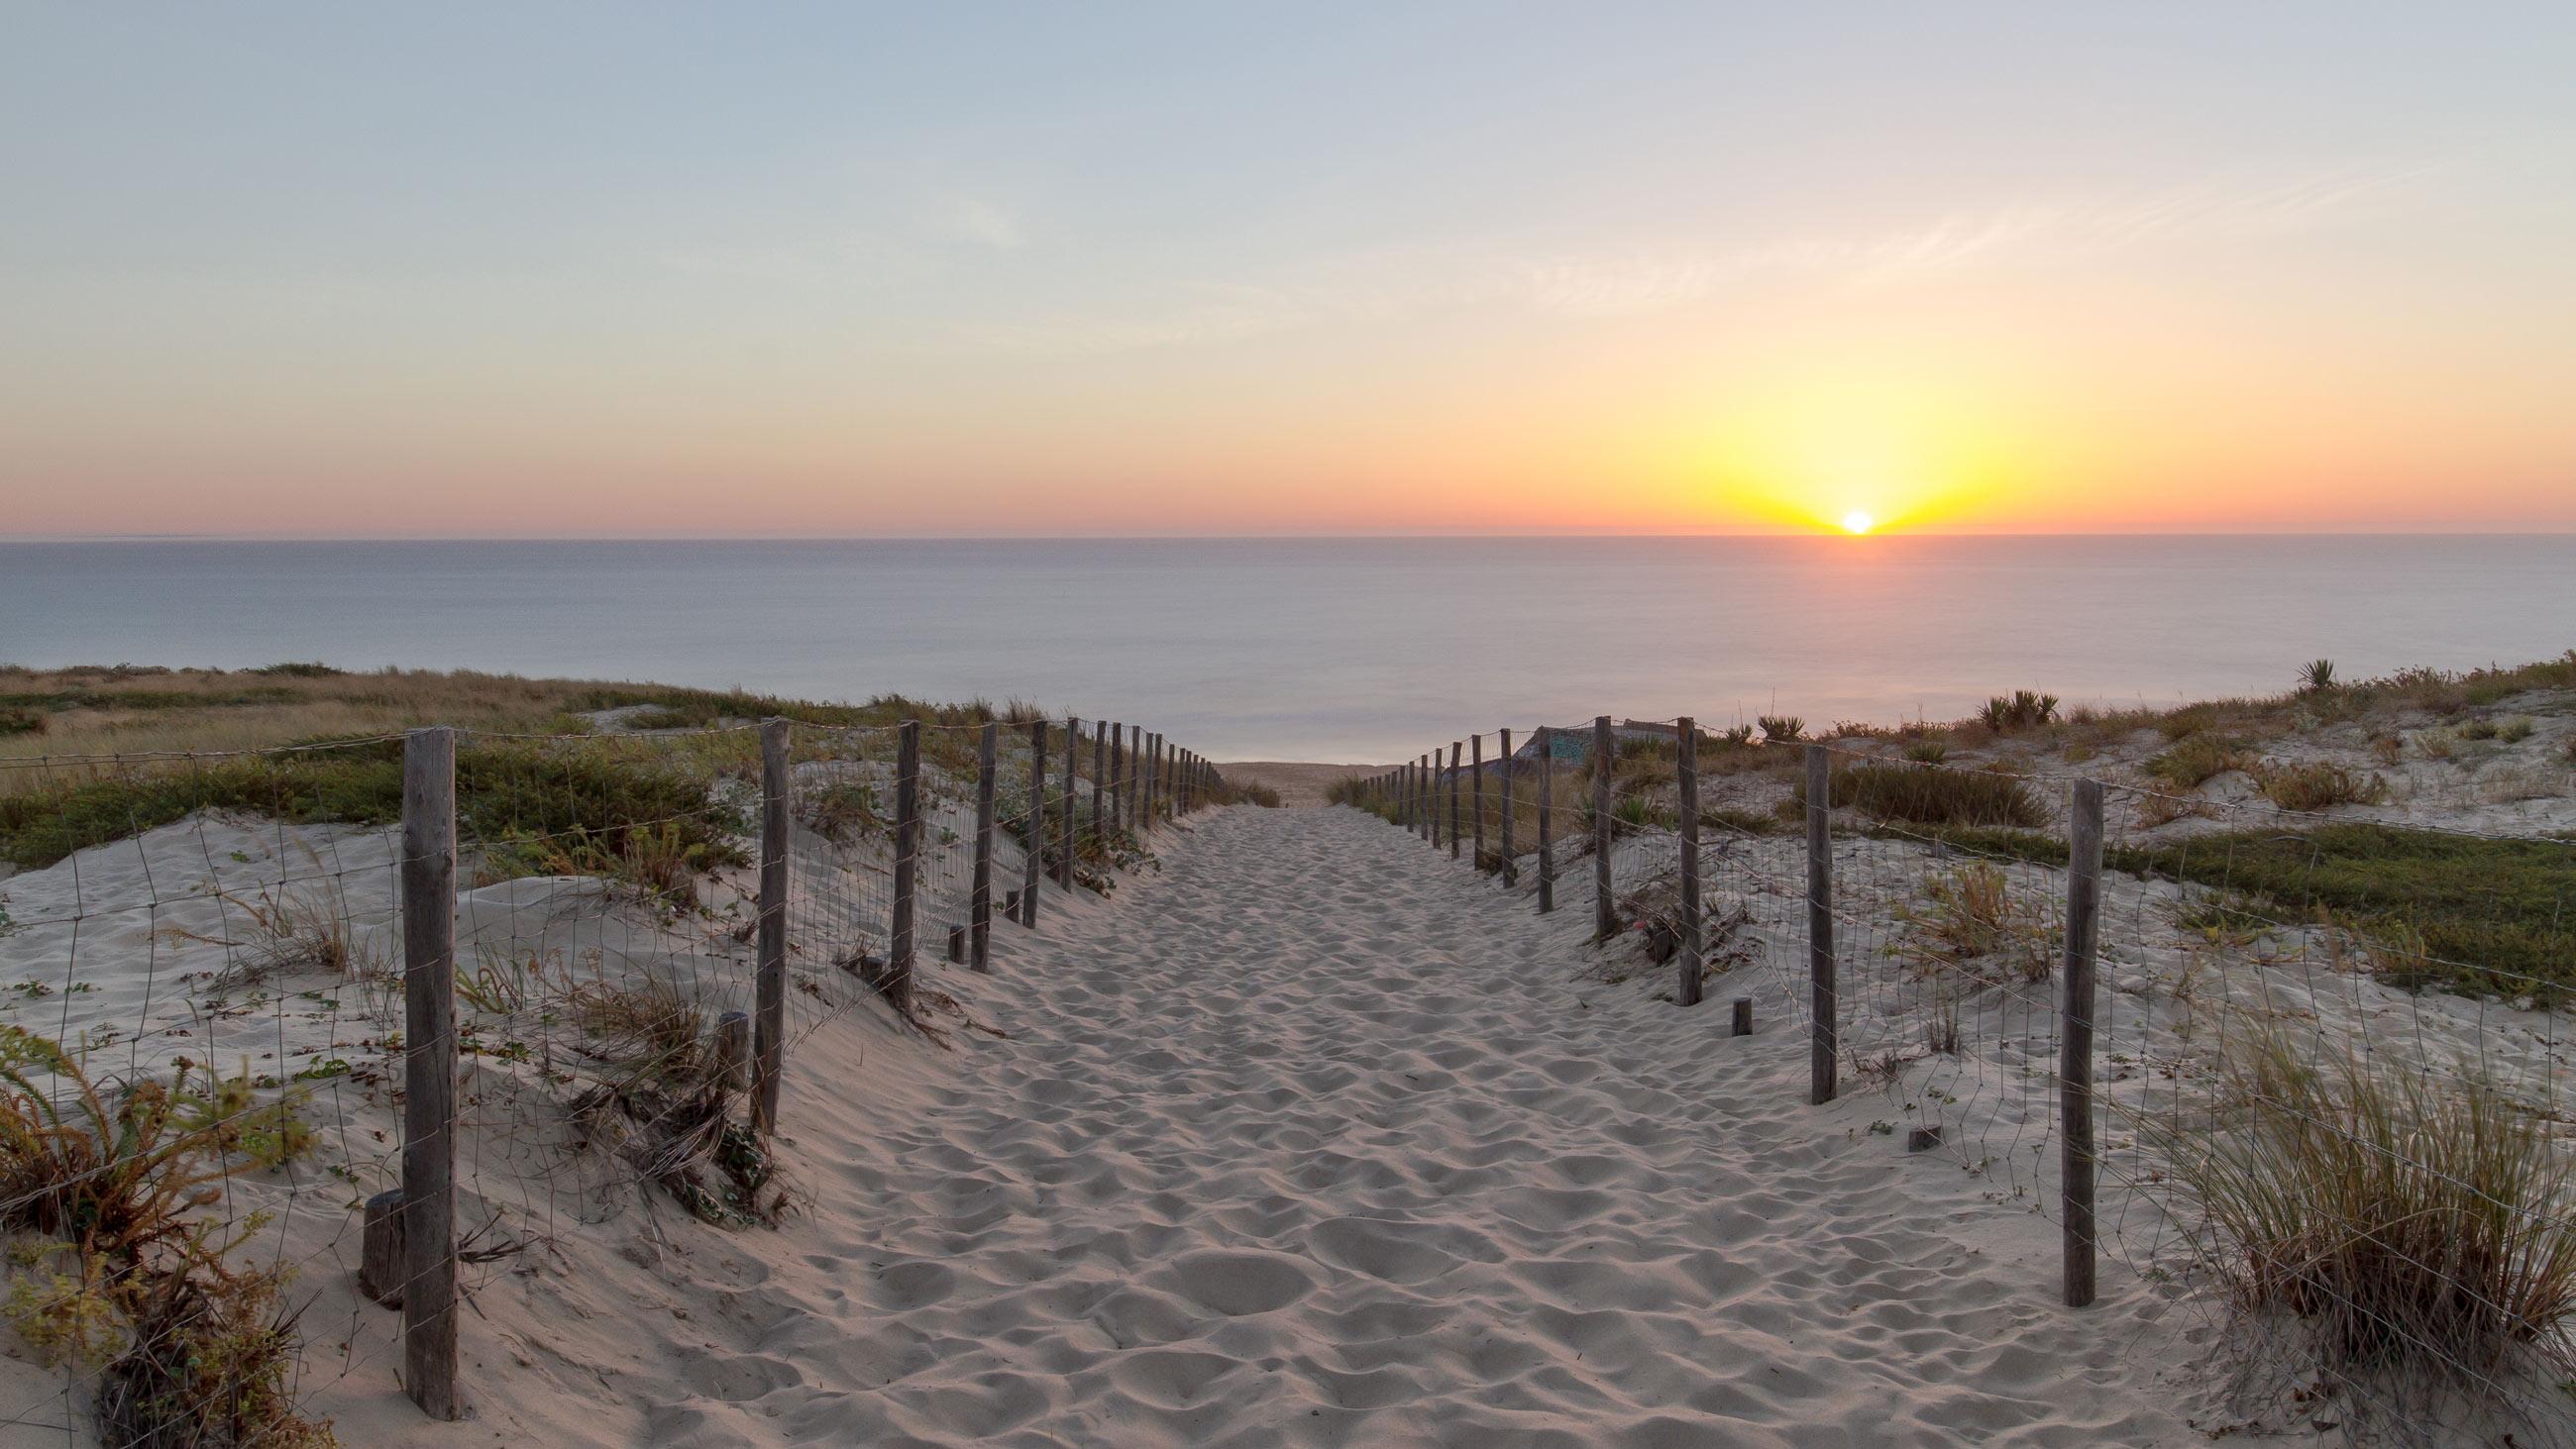 capferret-france-beach-paradise-dune-surf-kite-travel-holiday